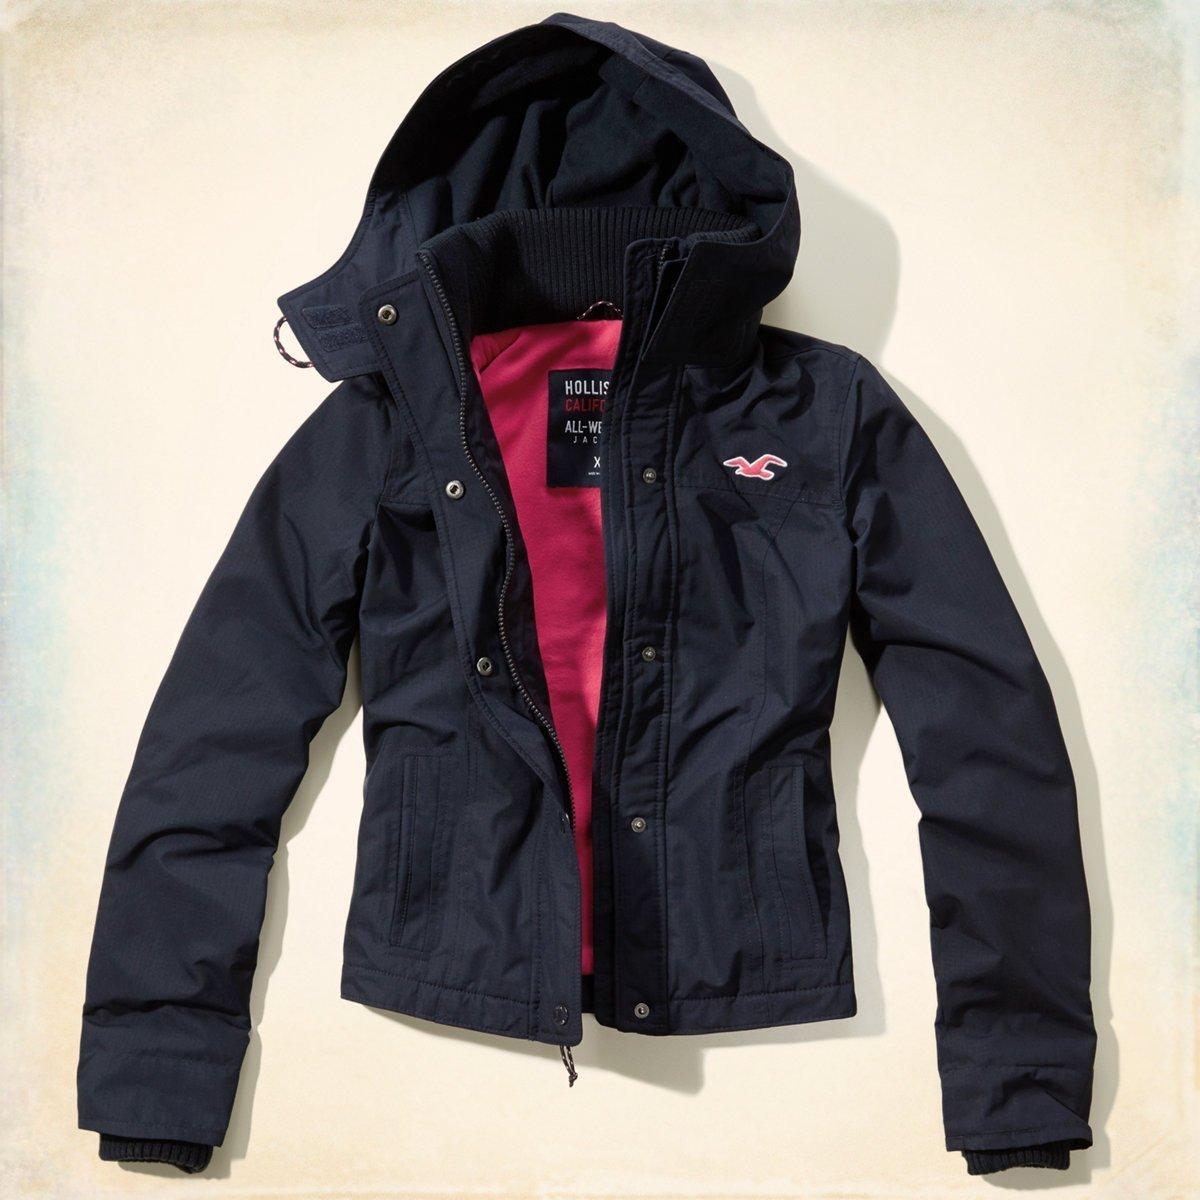 Hollister All-Weather Jacket Navy Color (XS) 女生 全天候 防風外套